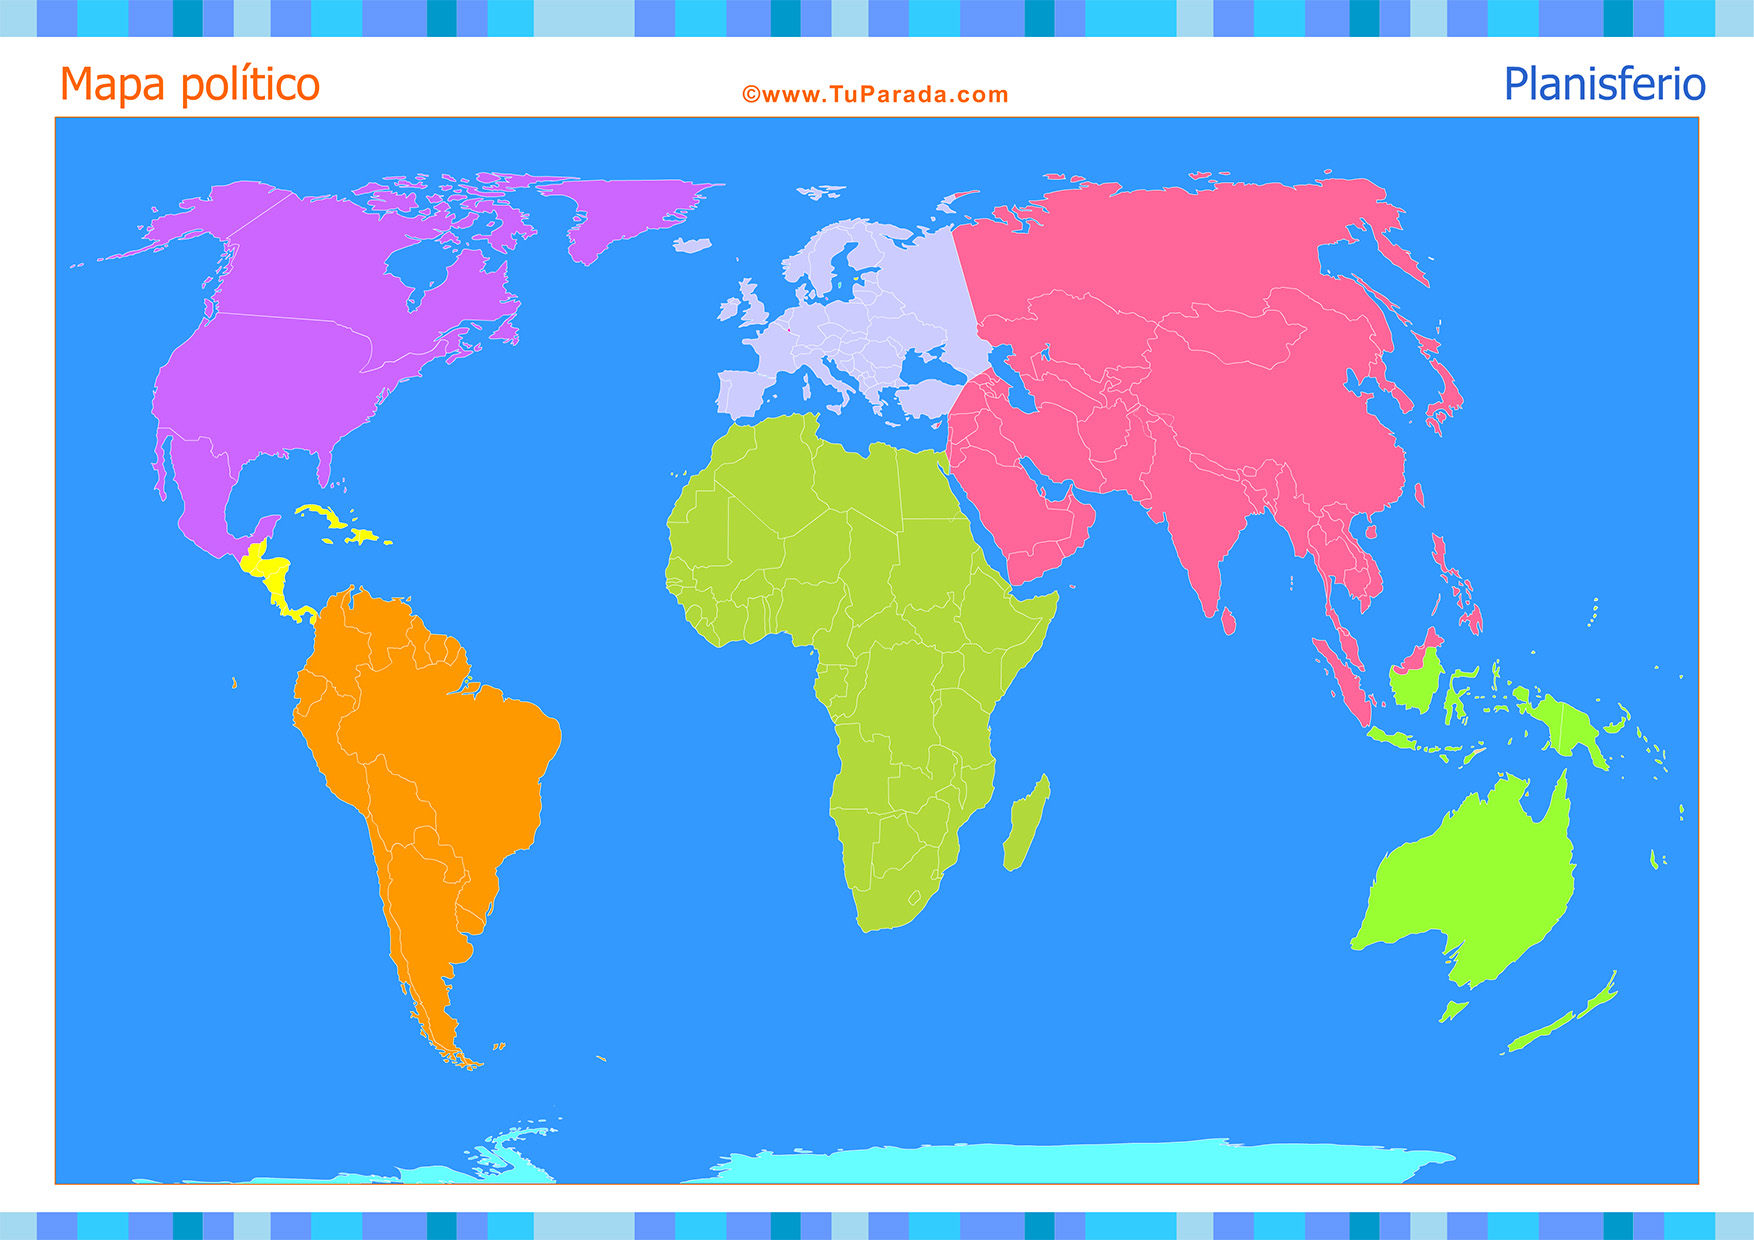 Tarjeta - Mapa Planisferio para completar